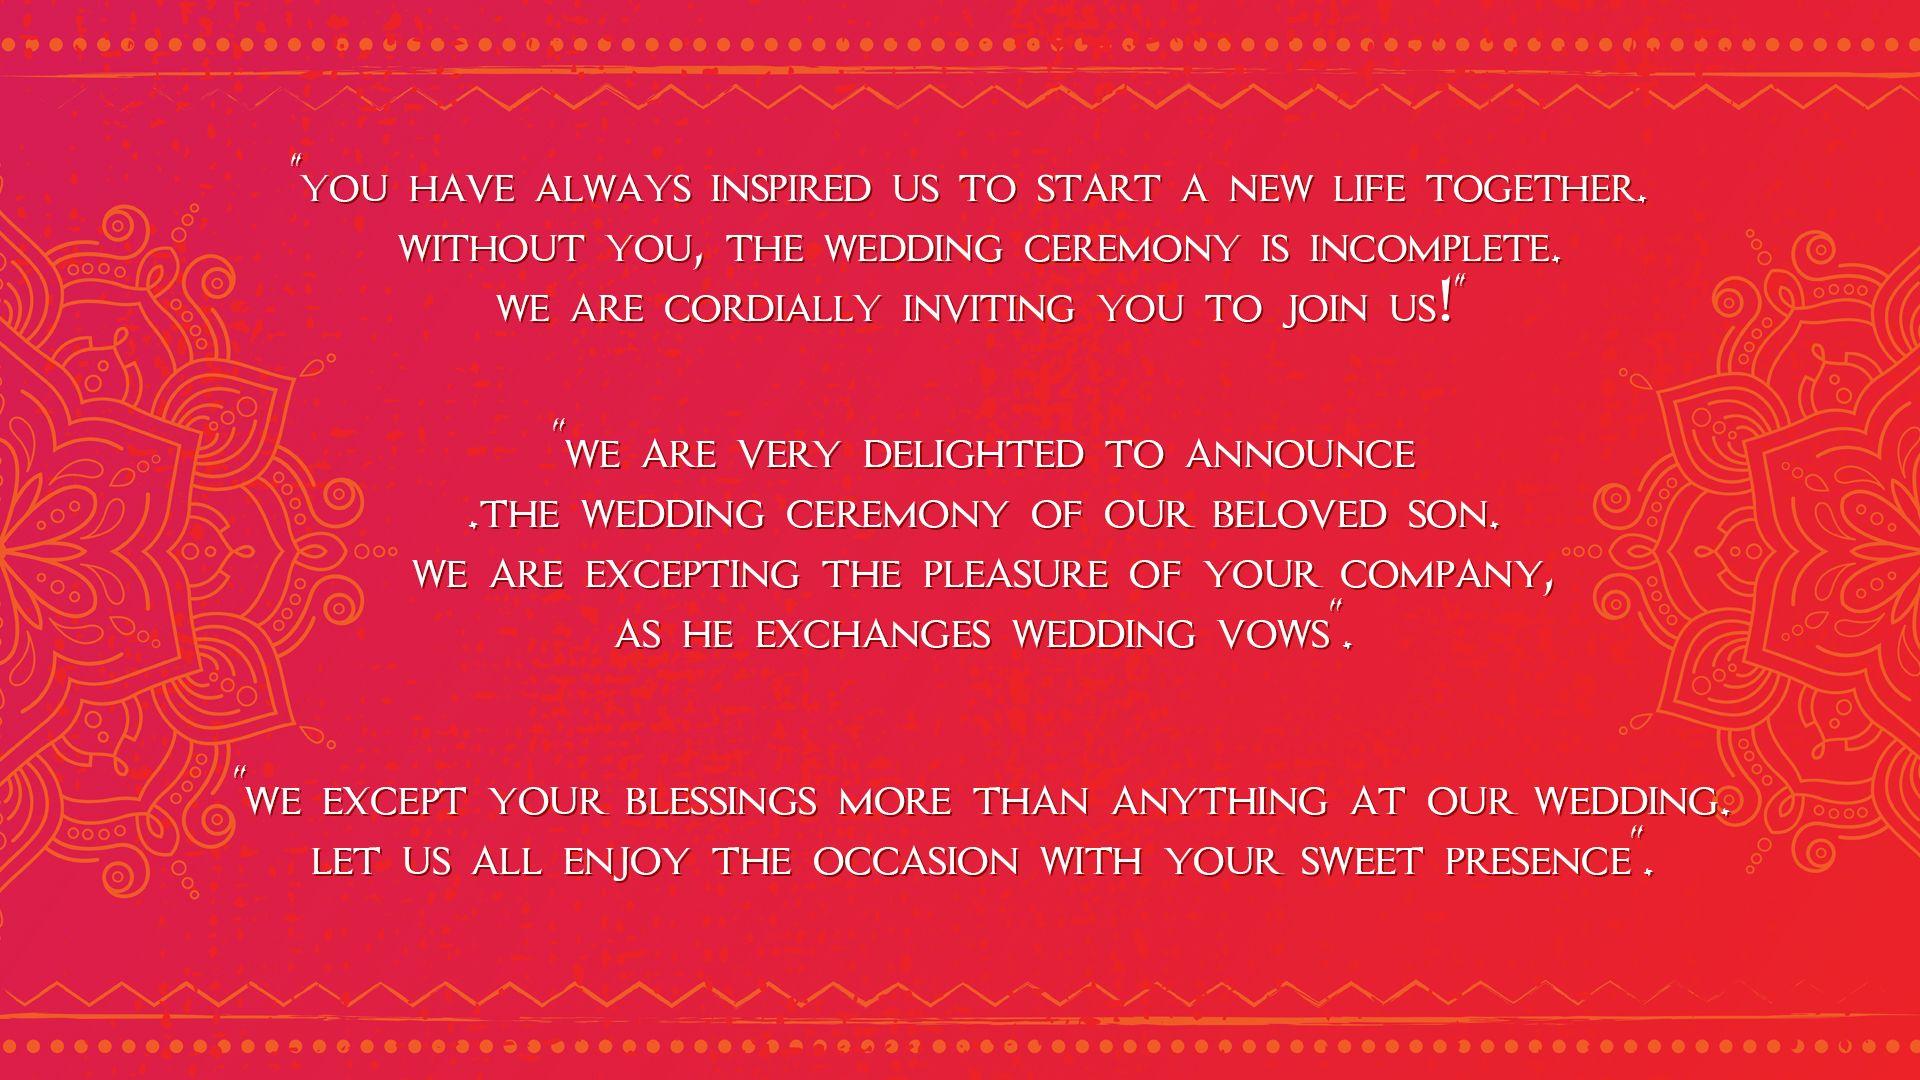 Best Wedding Invitation Messages | Inviter.com